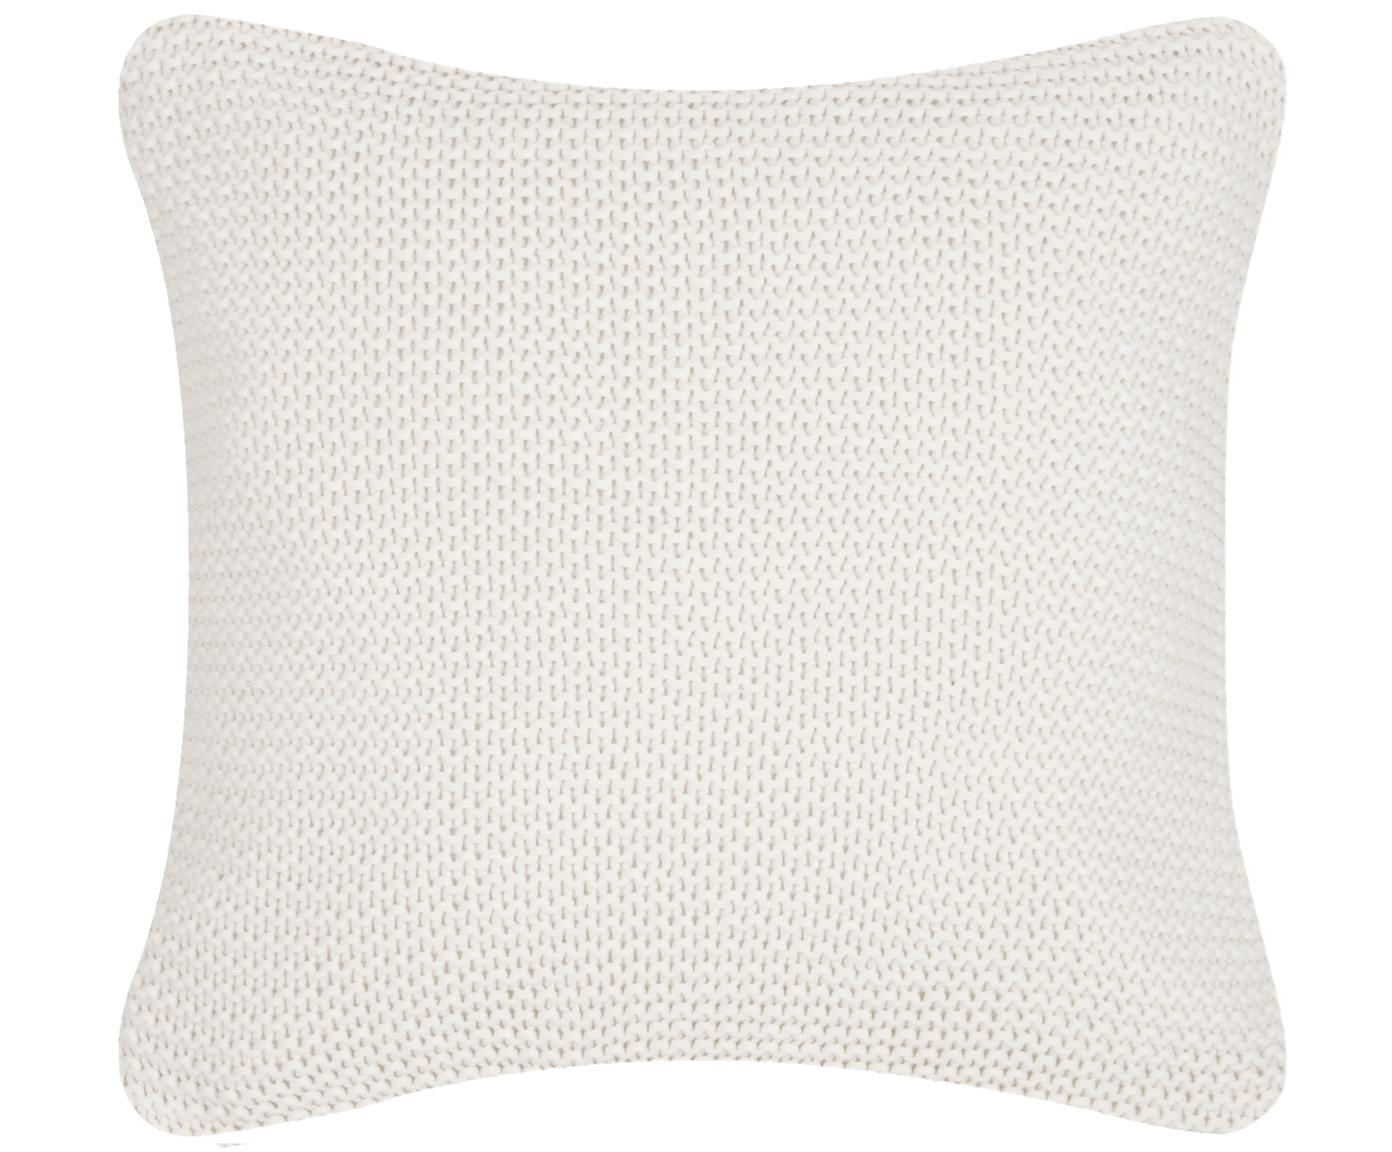 Federa arredo fatta a maglia bianco Adalyn, 100% cotone, Bianco naturale, Larg. 40 x Lung. 40 cm